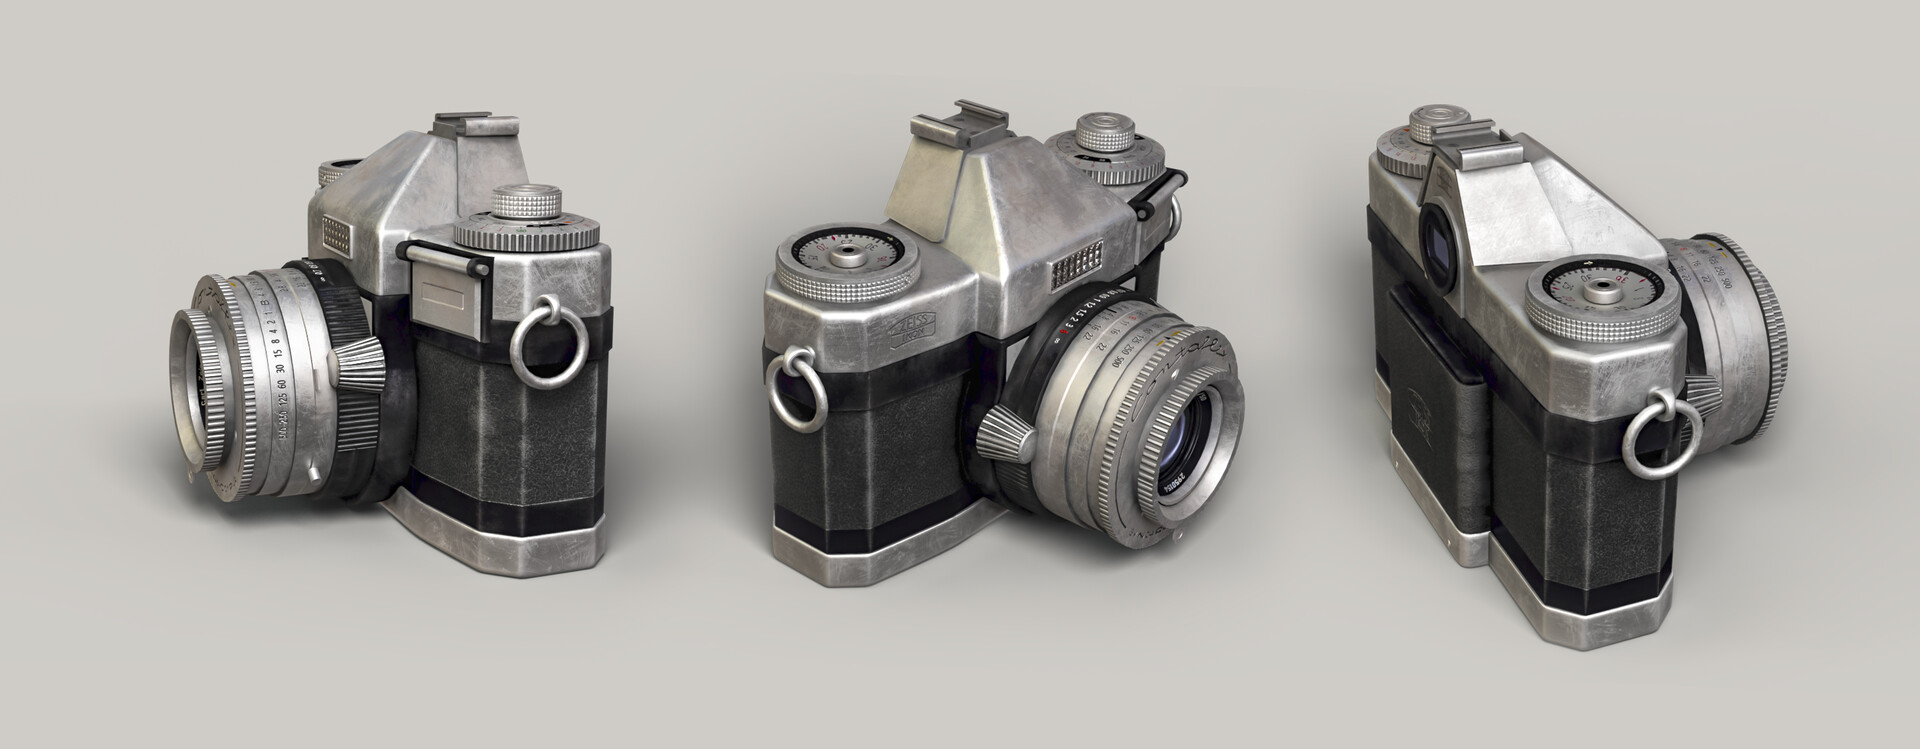 ArtStation - Vintage Camera, Alina Zhdanova